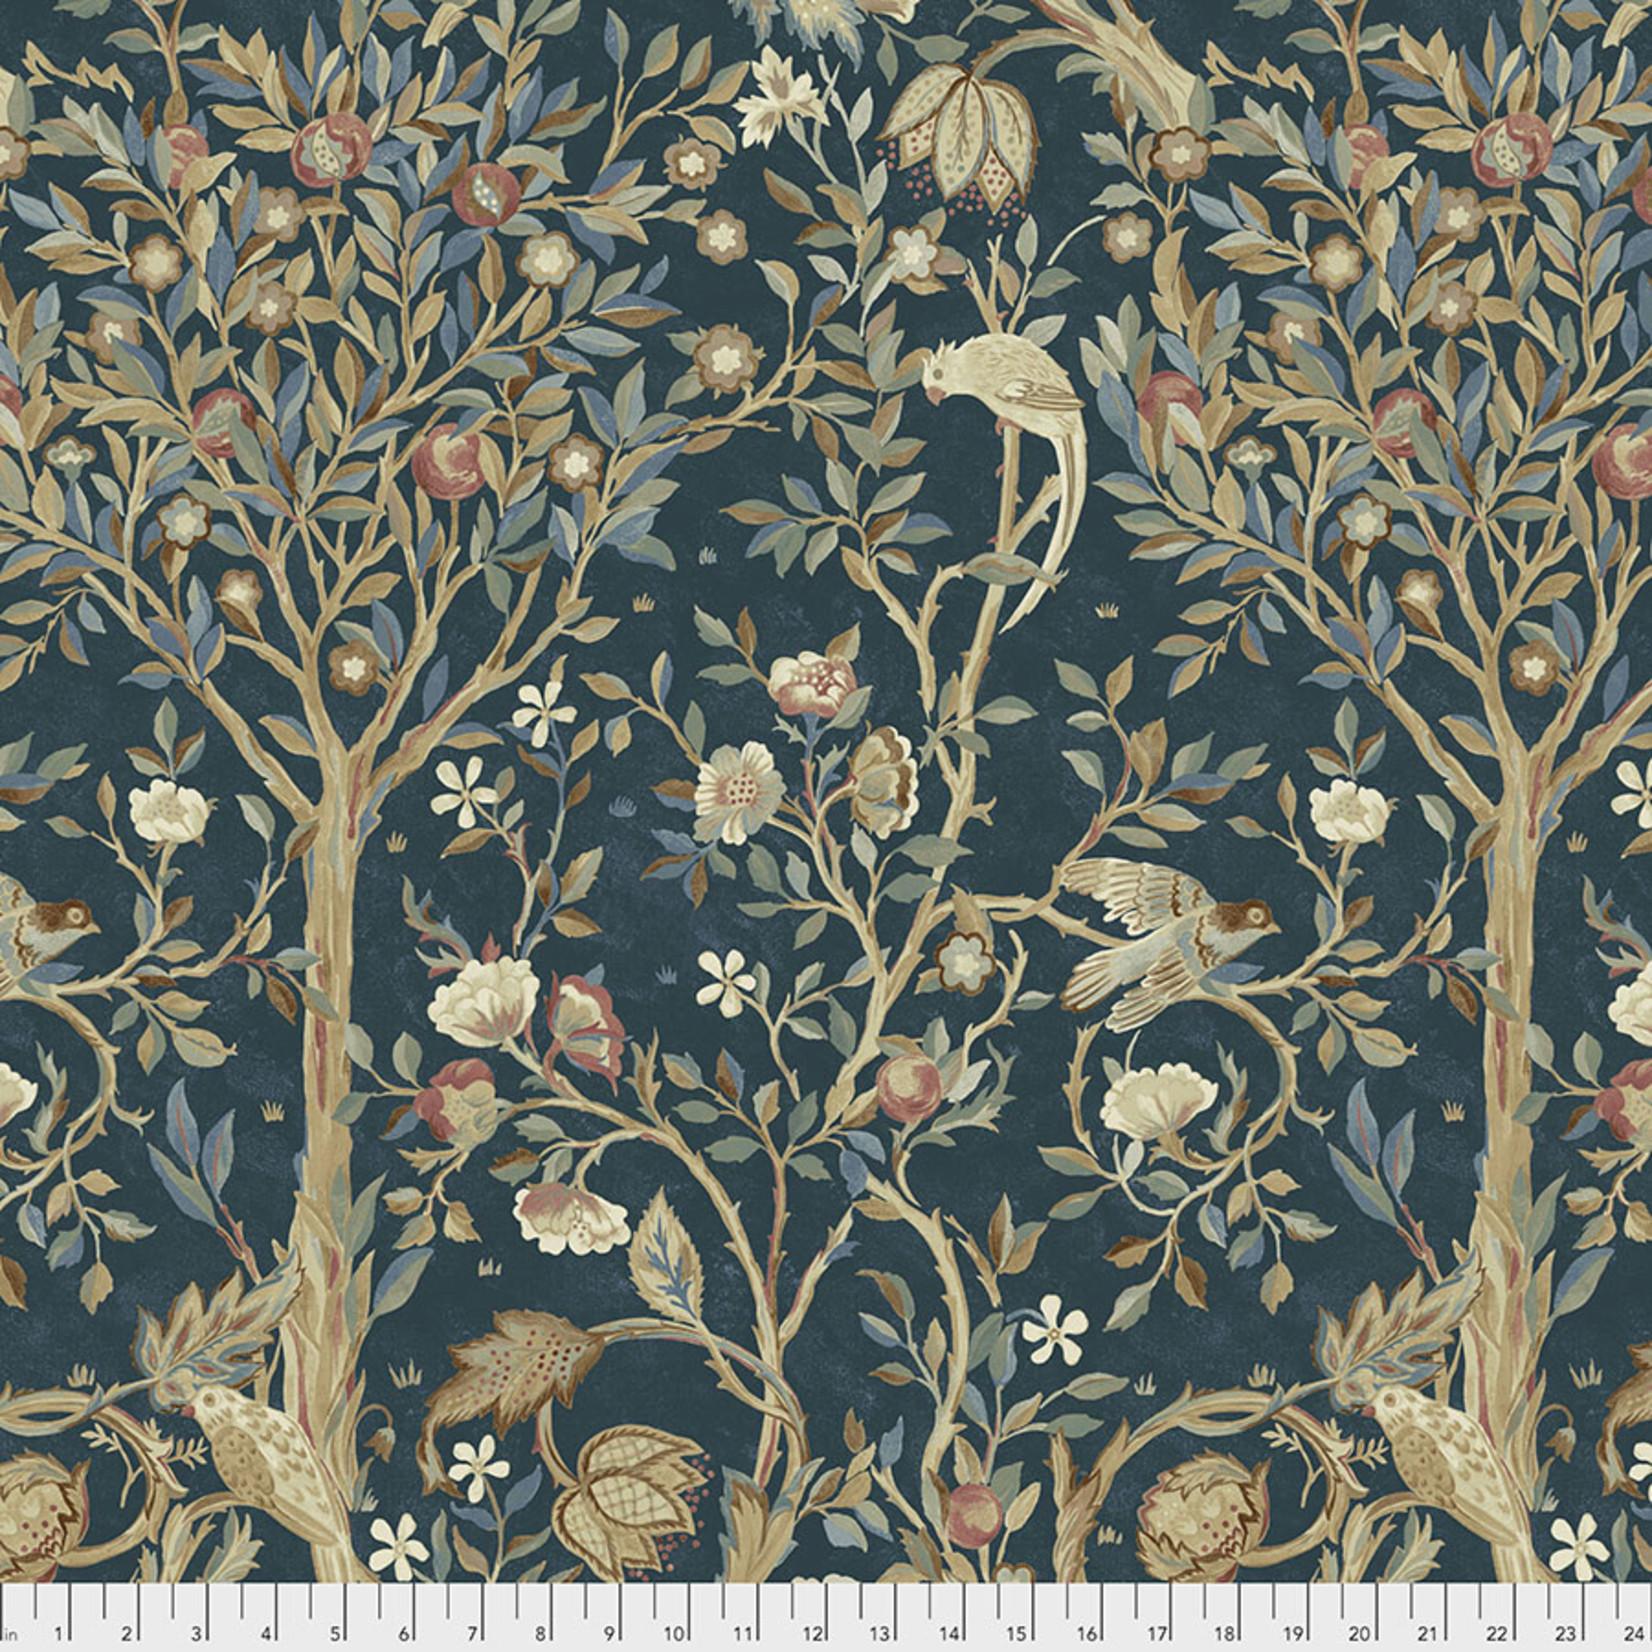 Morris & Co Orkney, Melsetter - Indigo (PWWM041) per cm or $16/m